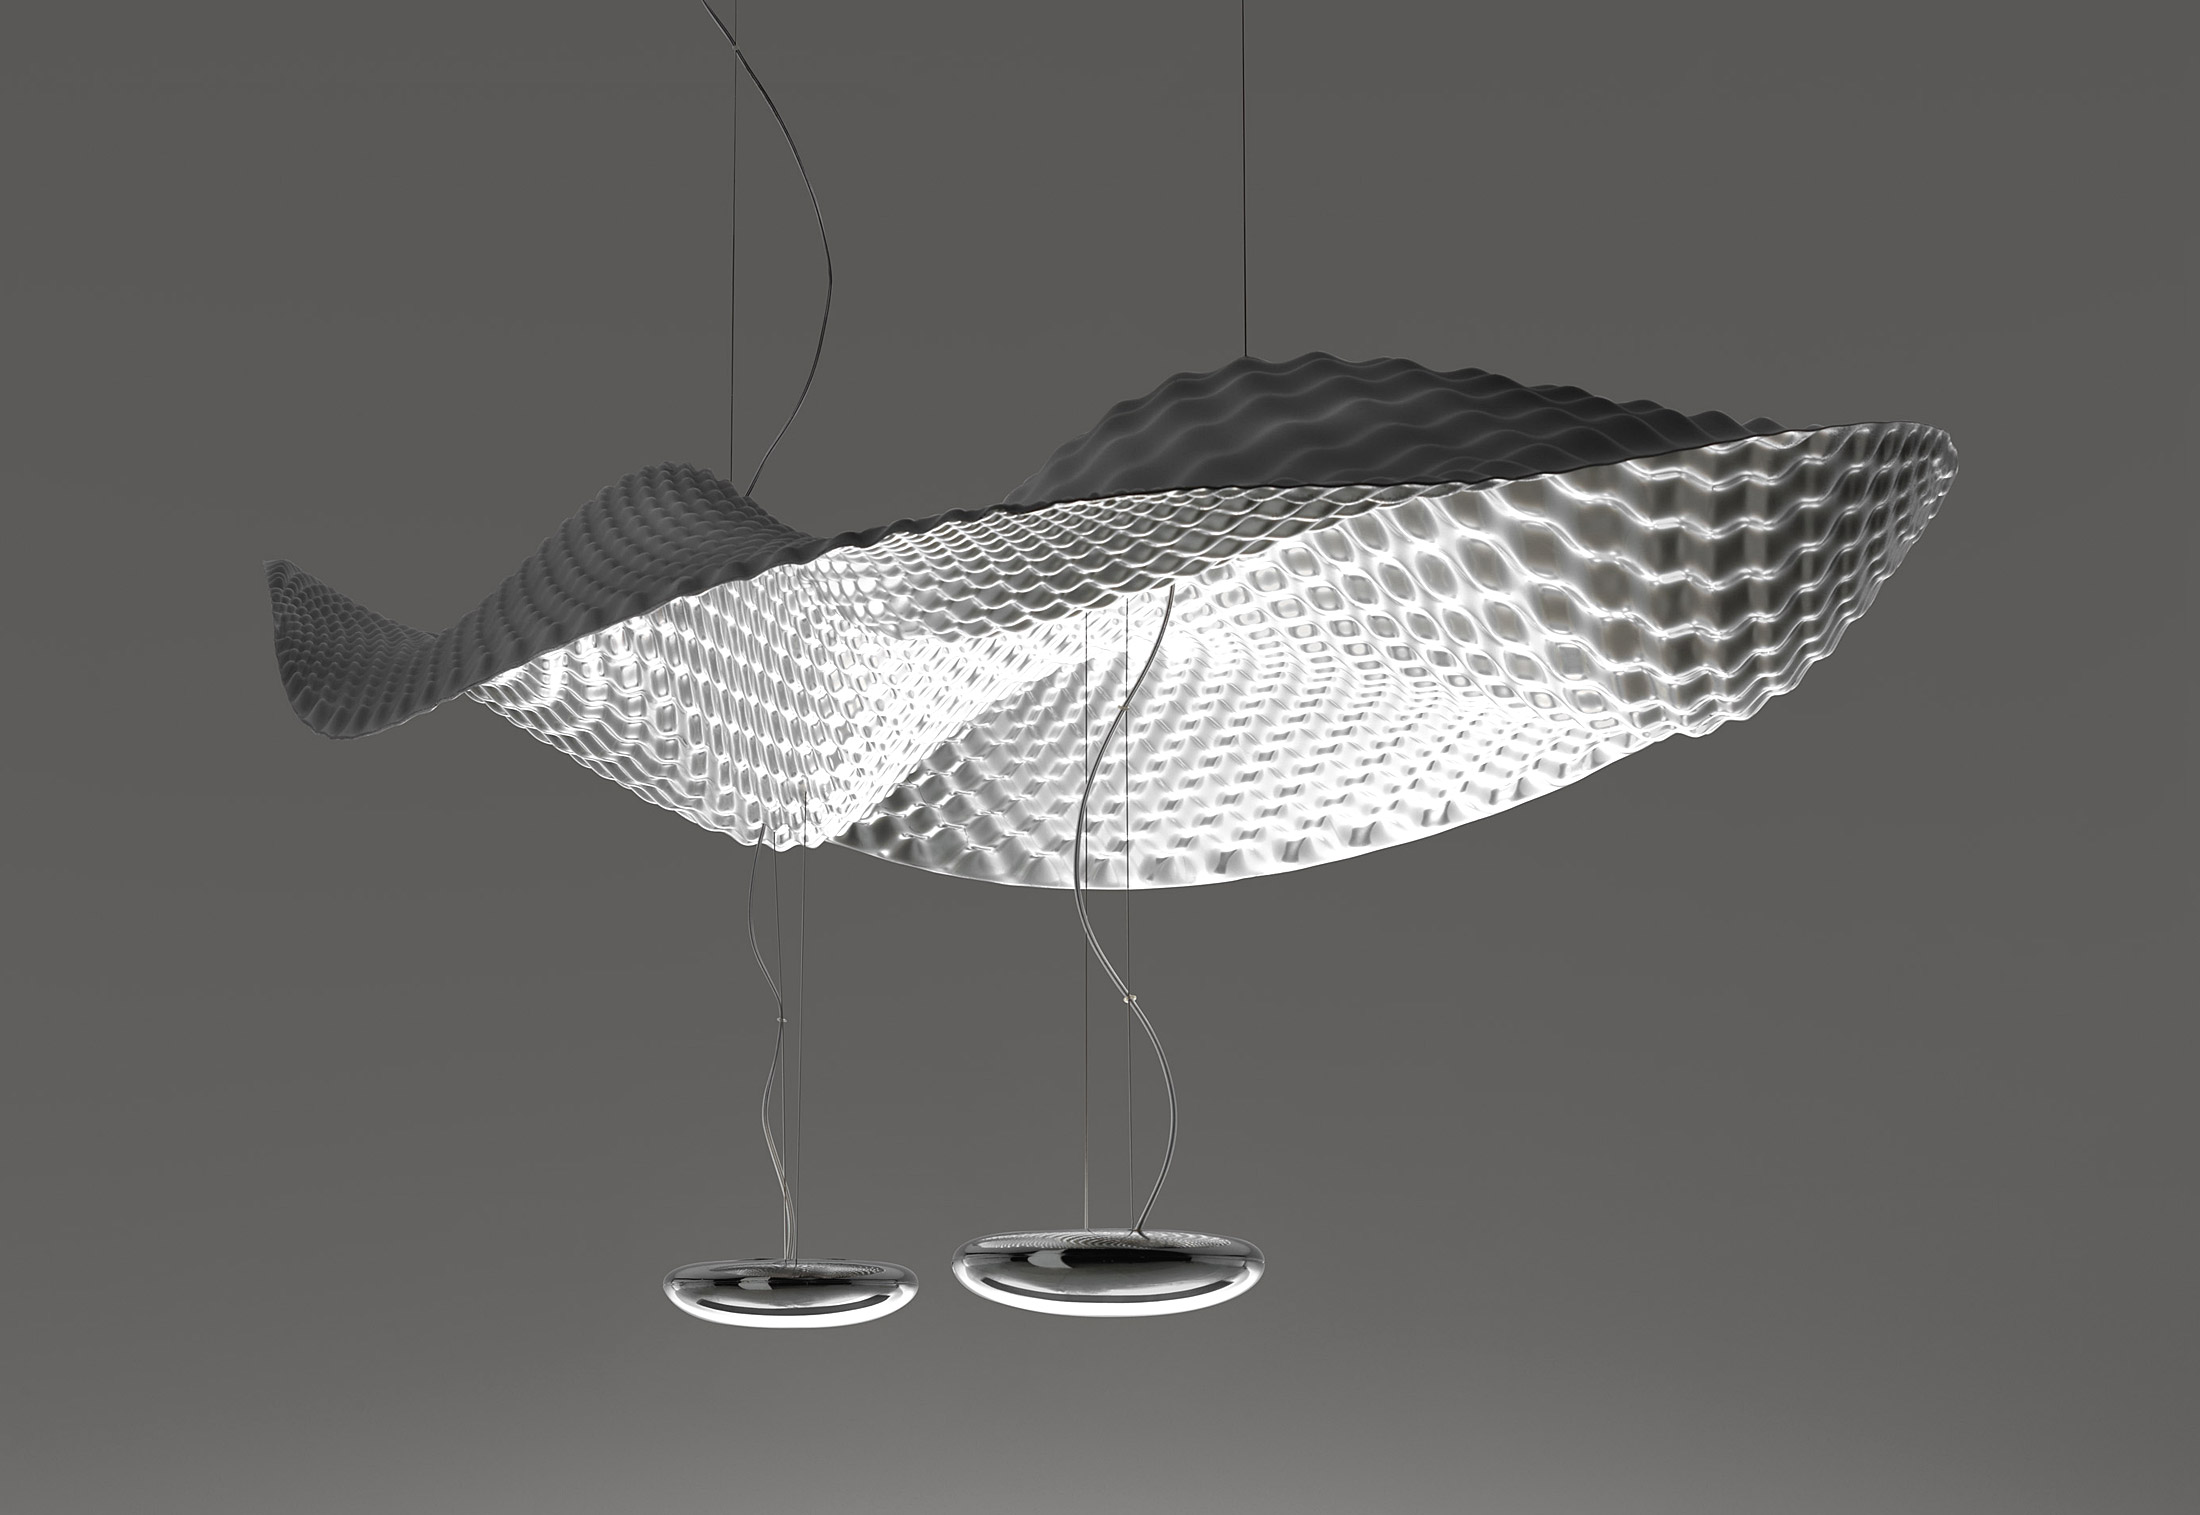 Cosmic Angel sospensione di Artemide   Lampadari   Illuminazione   Mollura Home Design -> Lampadario Sospensione Artemide